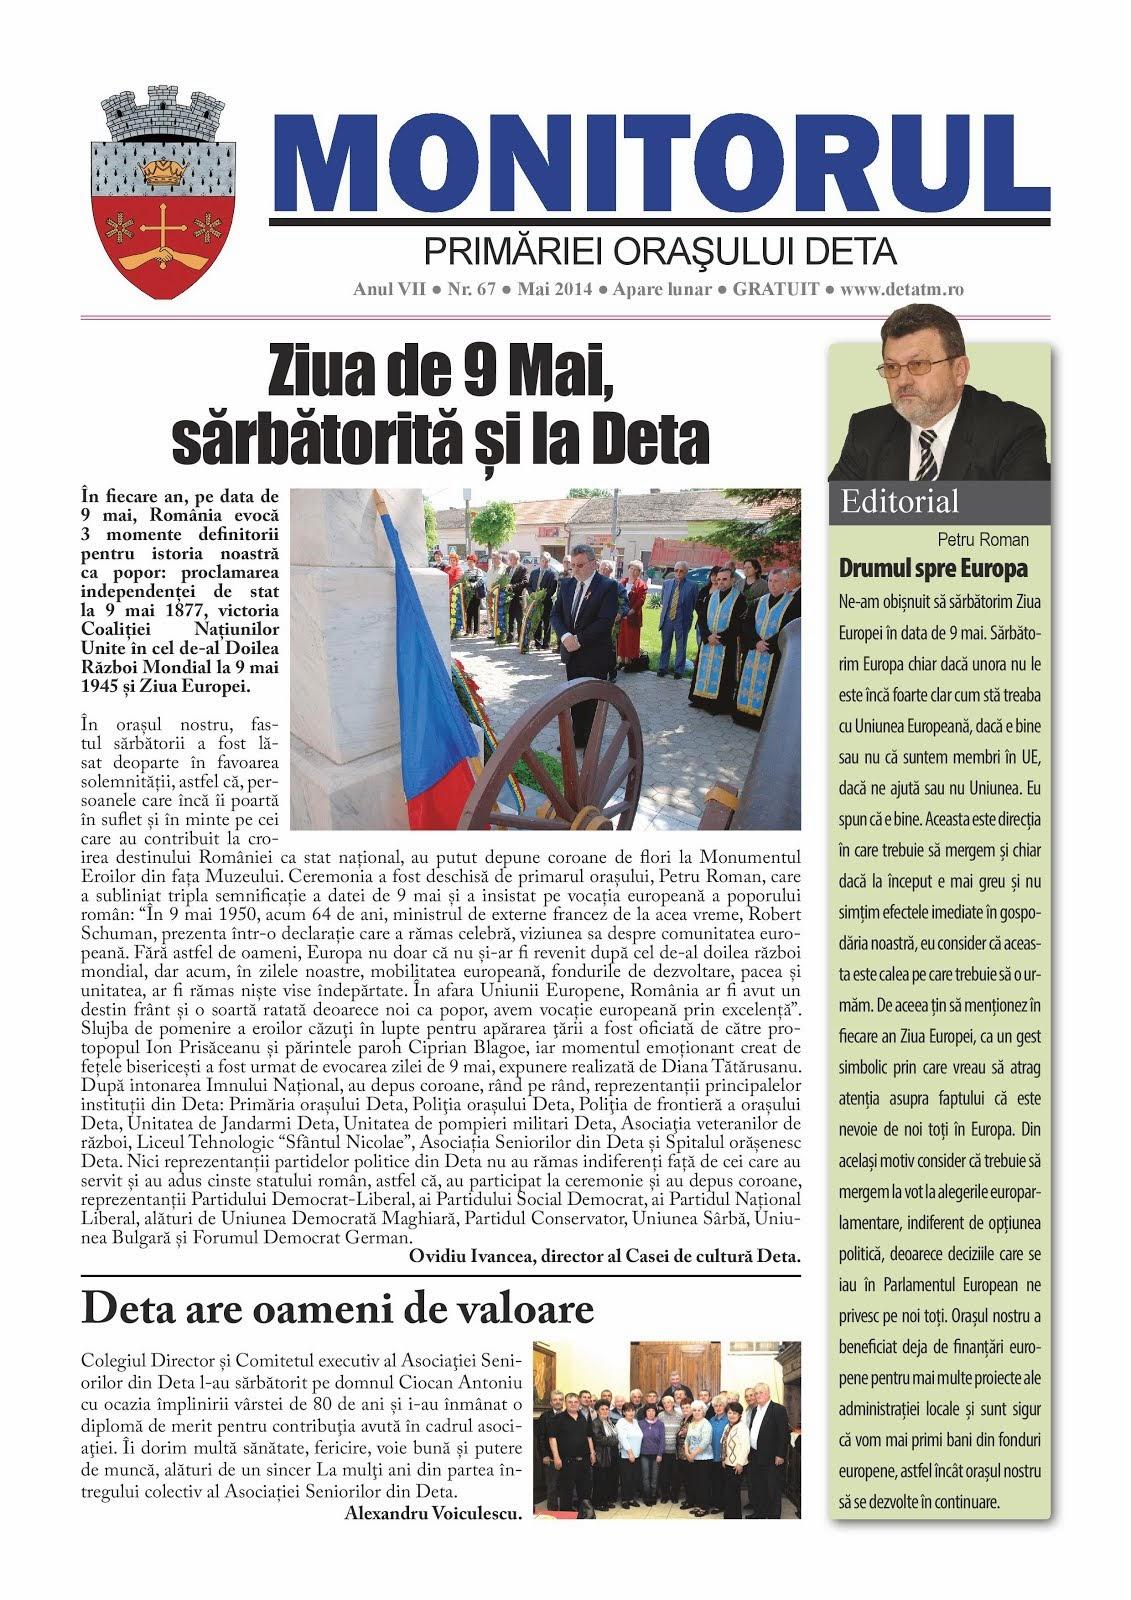 Monitorul - mai 2014